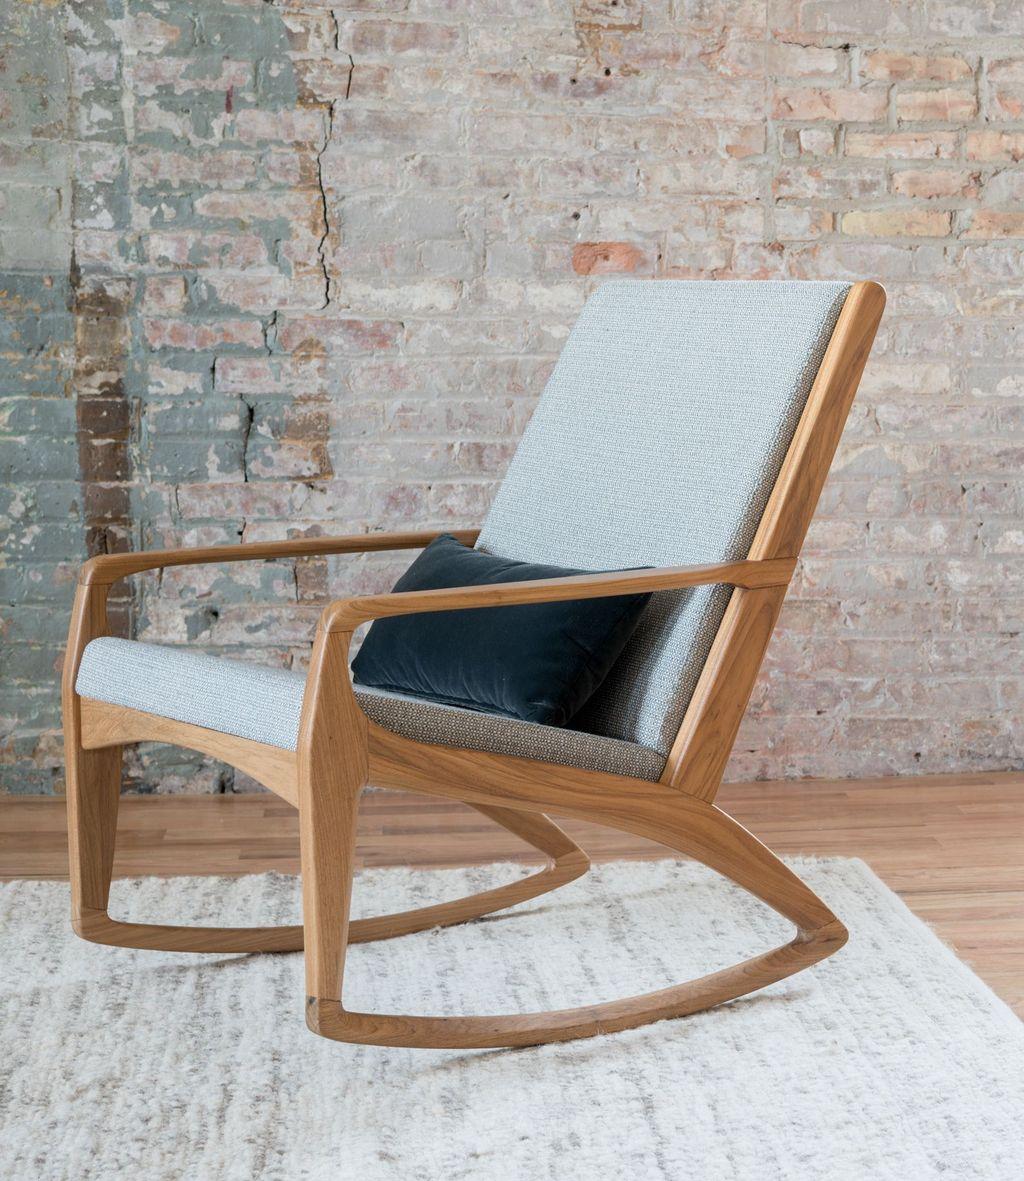 Amazing Rocking Chair Design Ideas 12